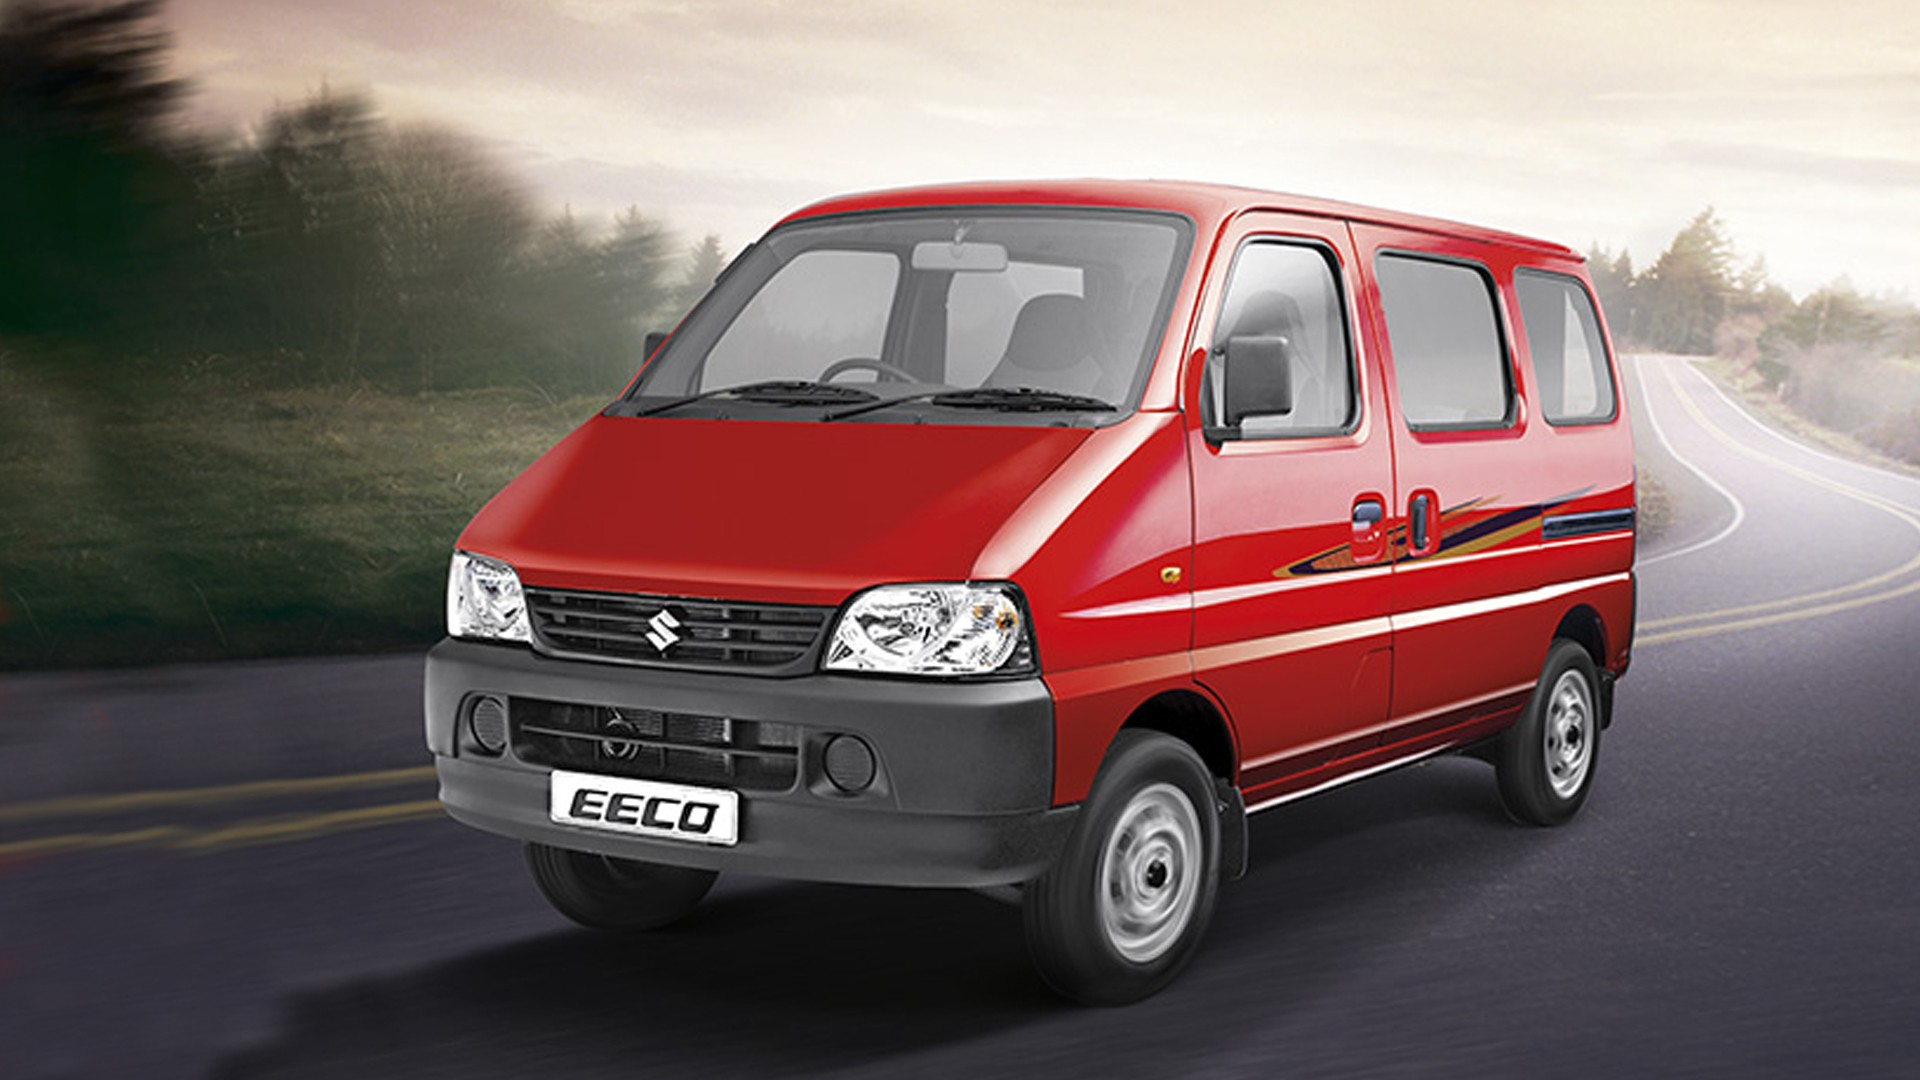 Maruti Car Wayring Diygraam Maruti Suzuki Eeco 2020 Price Mileage Reviews Of Maruti Car Wayring Diygraam